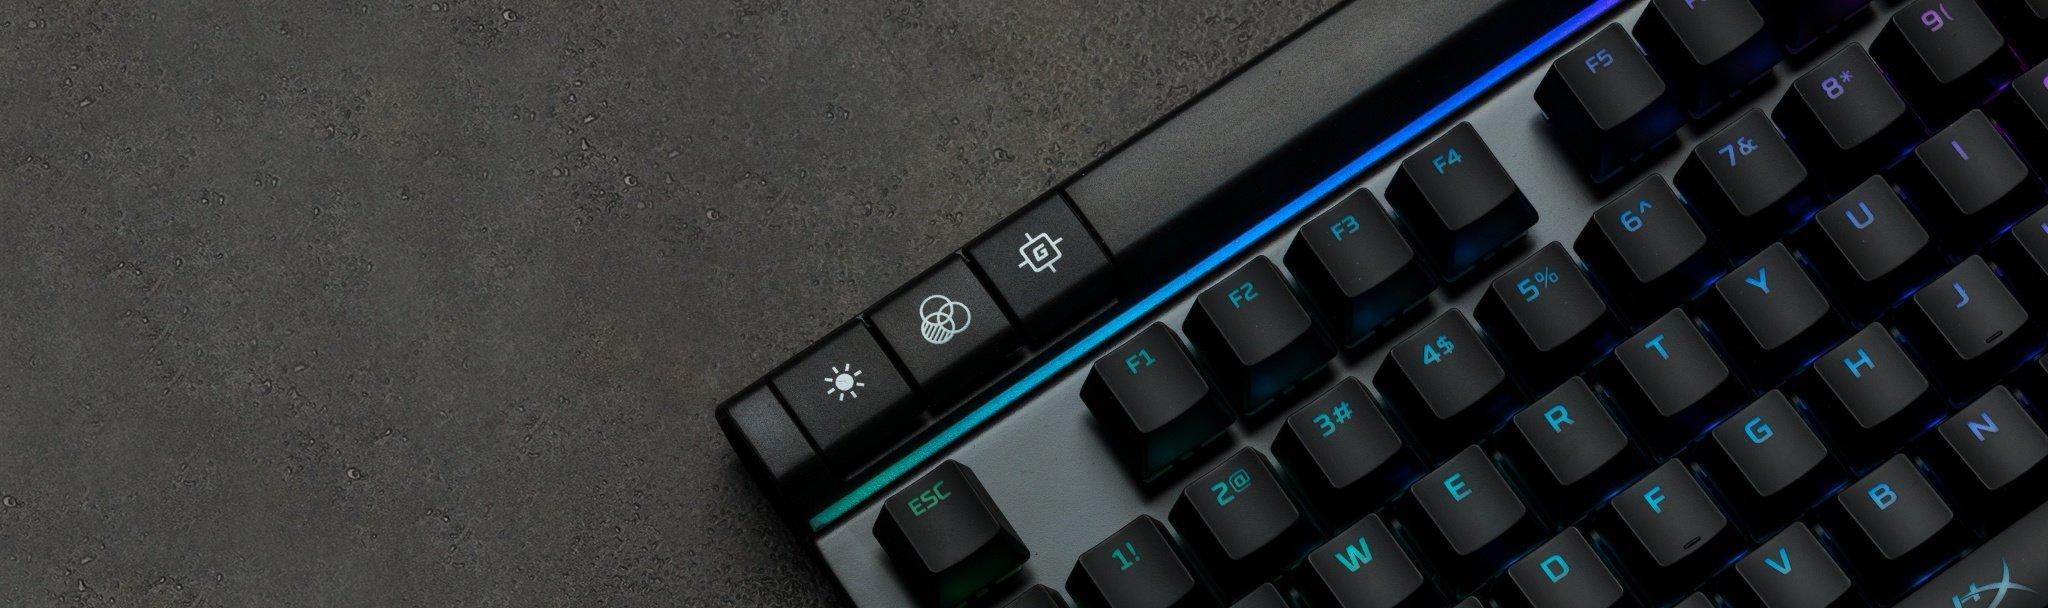 On-board memory for keyboard customisation